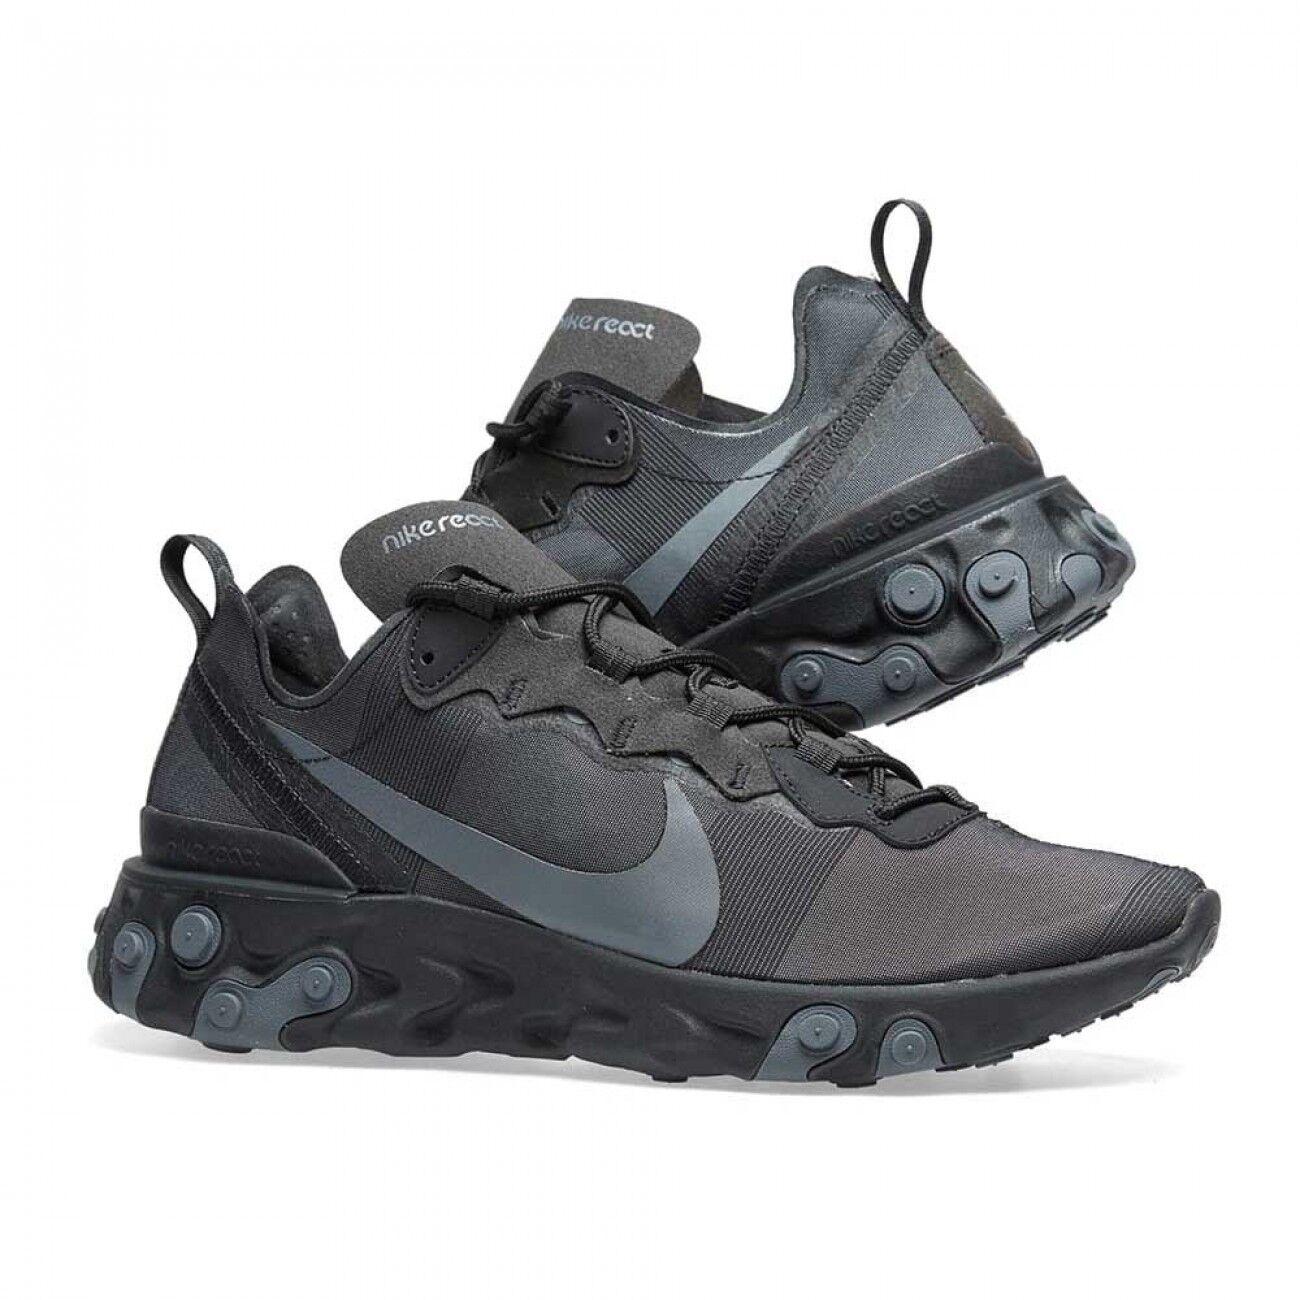 Nike React Element 55 Triple Black BQ6166-008 UK All Sizes  Brand New in Box